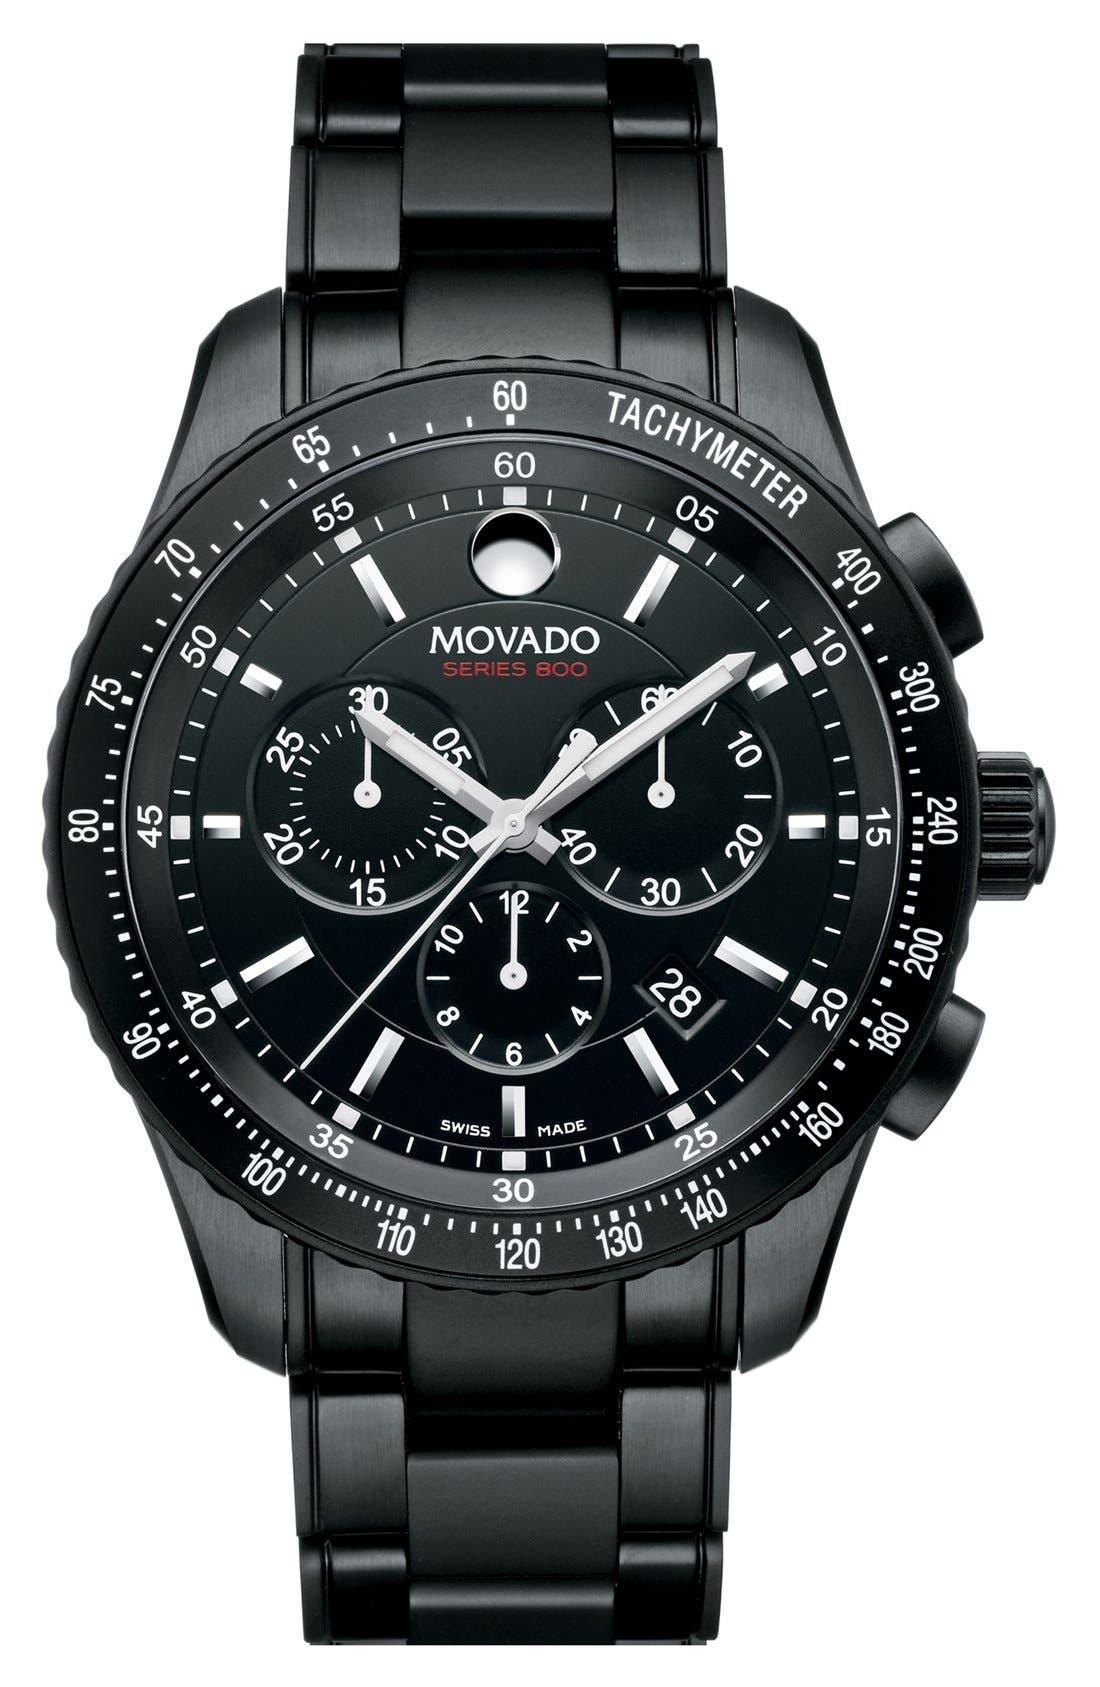 Alternate Image 1 Selected - Movado 'Series 800' Chronograph Bracelet Watch, 42mm